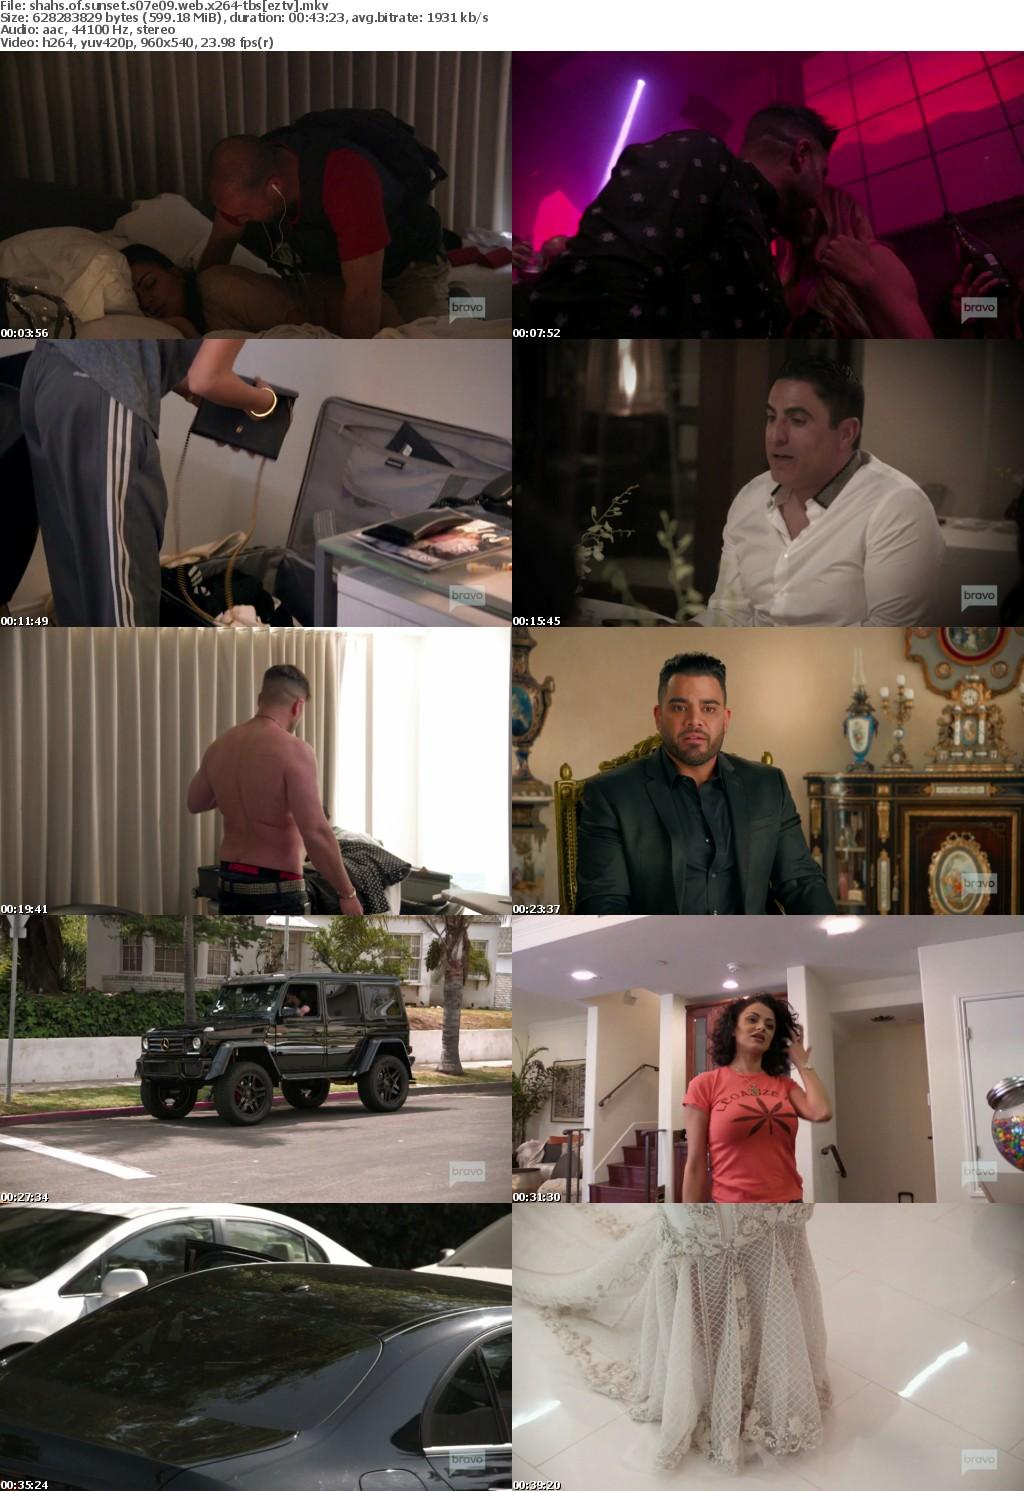 Shahs of Sunset S07E09 WEB x264-TBS